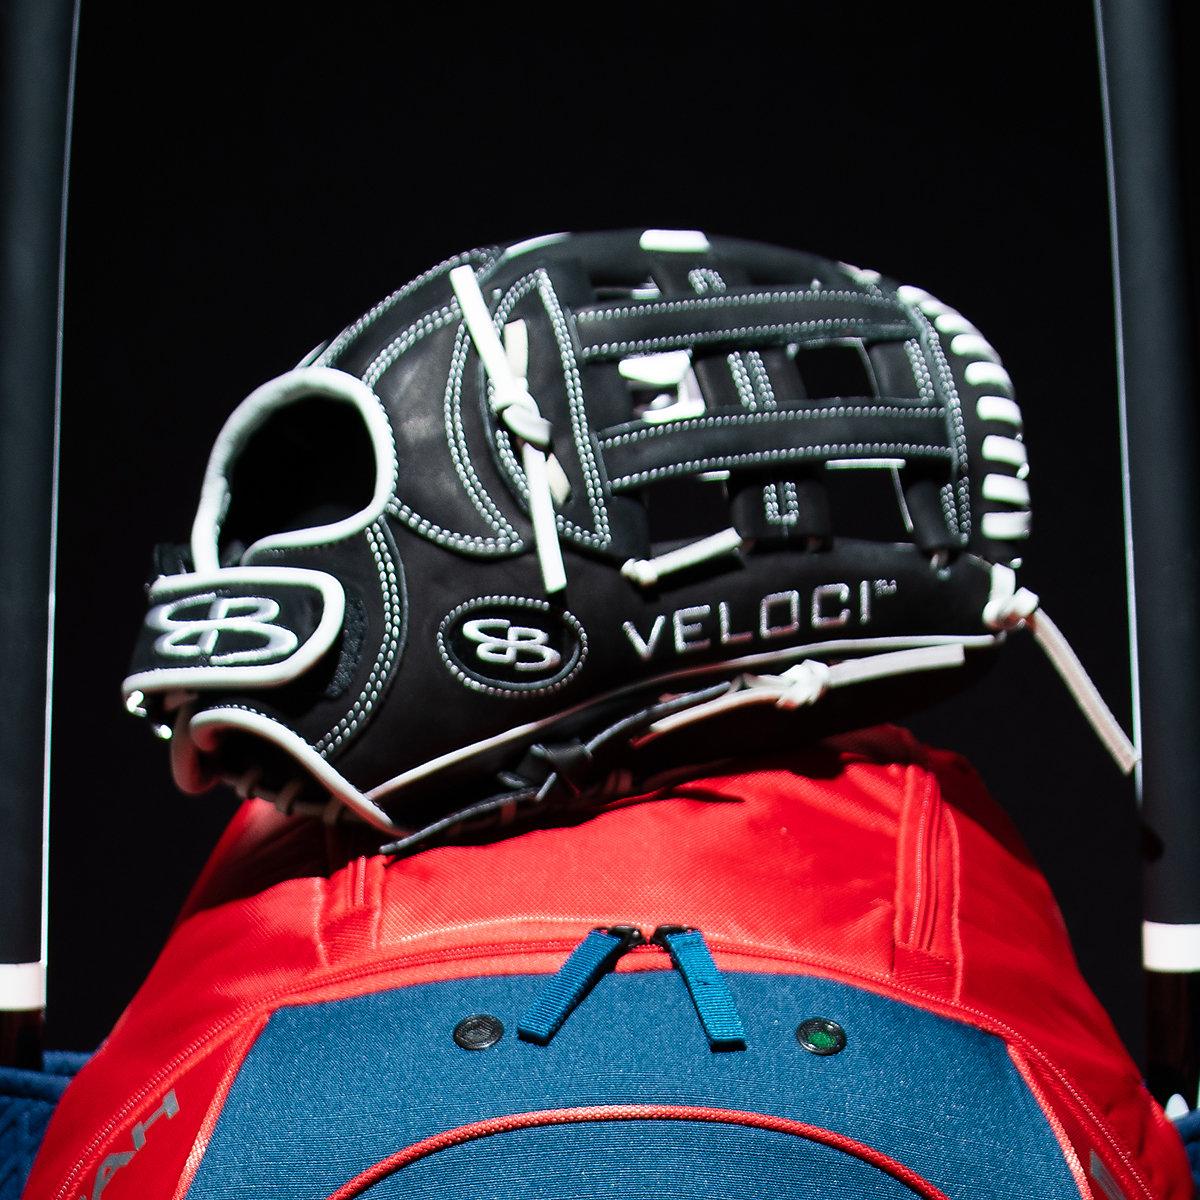 A baseball glove on top of a bat bag